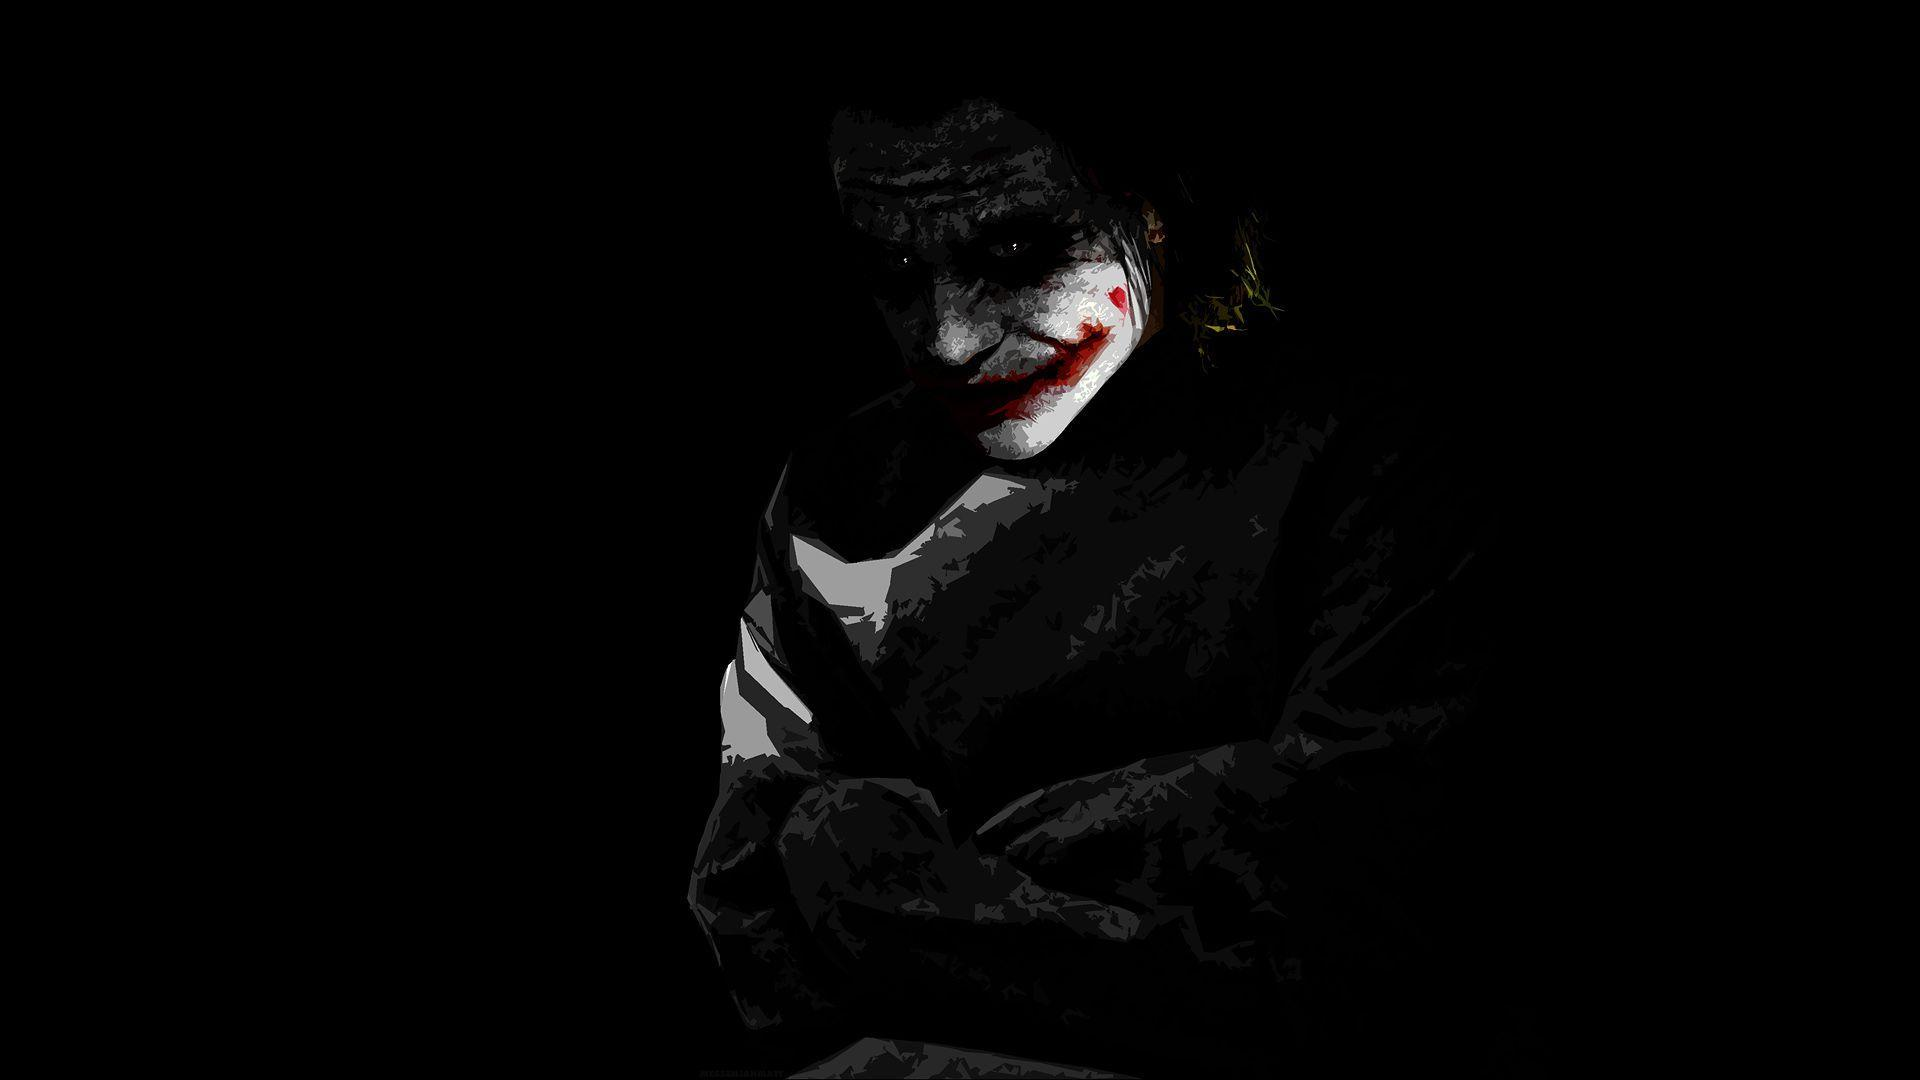 Letest Top10 Hate Love Wallpaper In Hd Or Widescreen: Joker Backgrounds